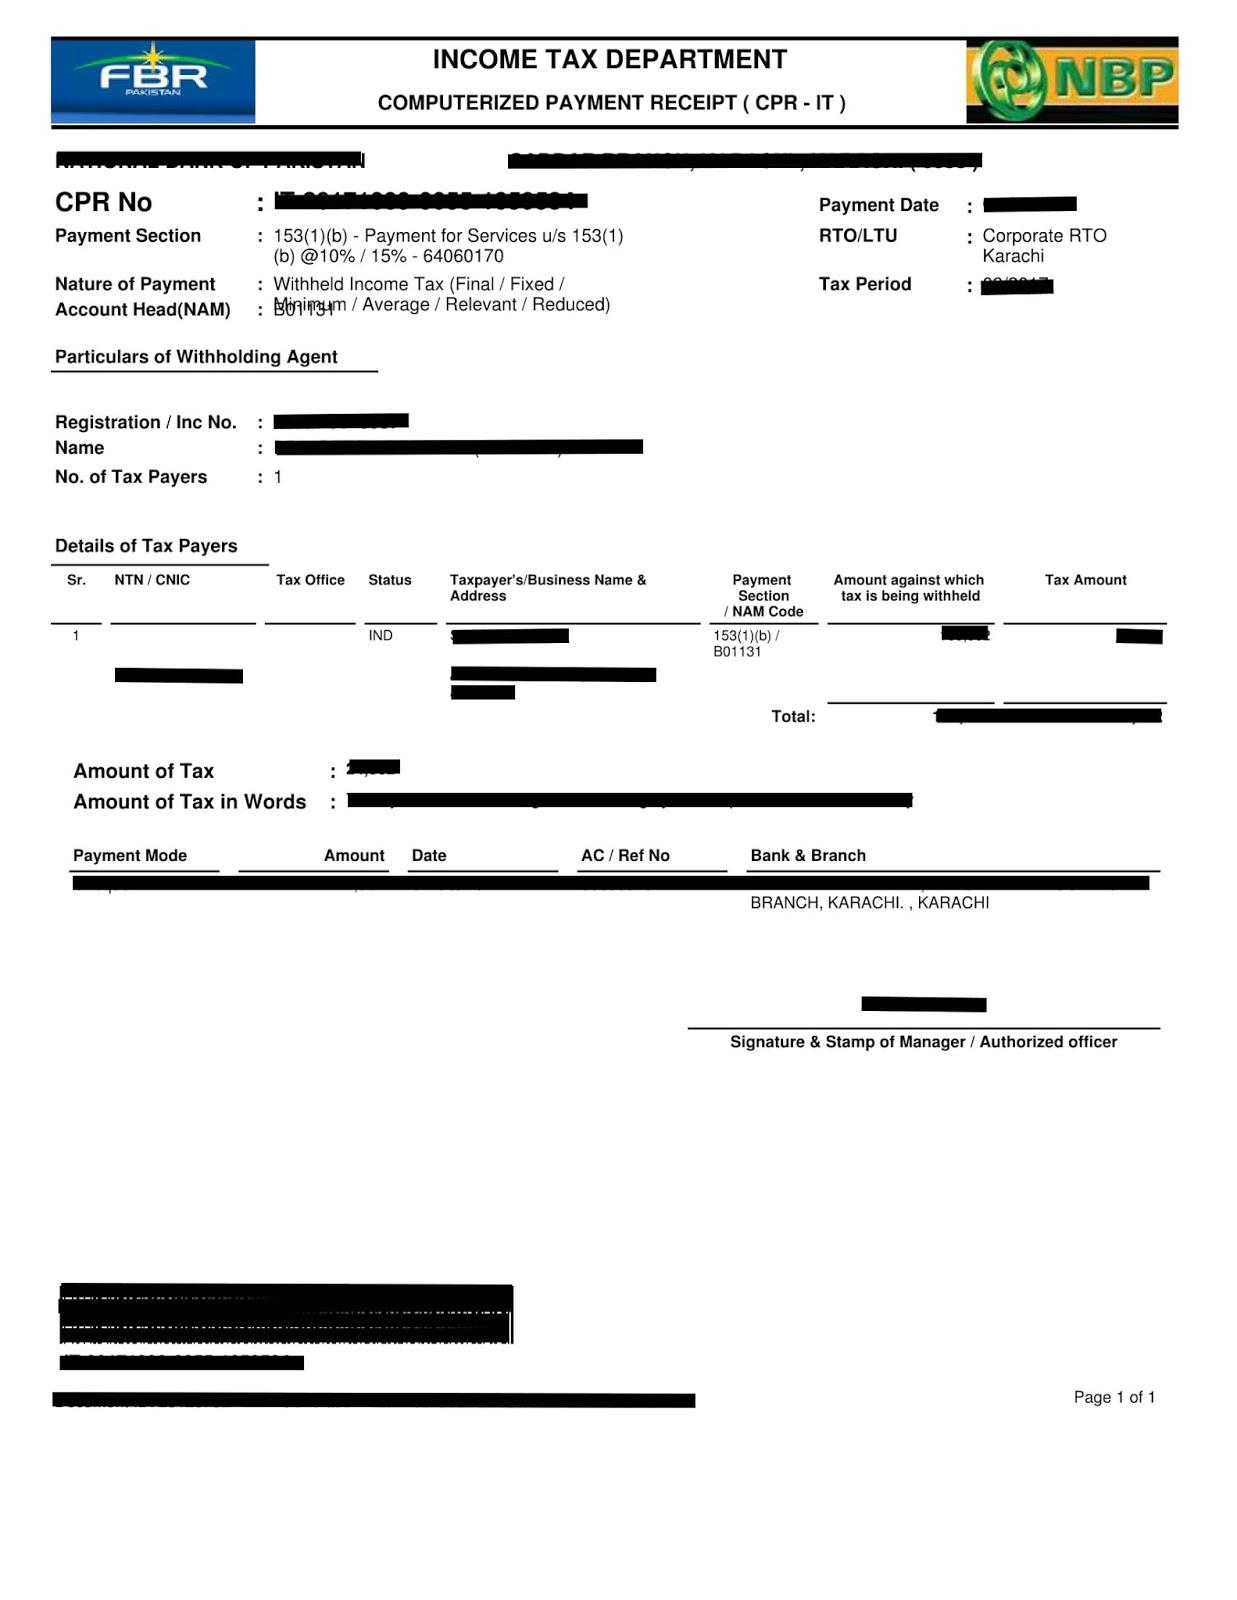 tfn application through tax agent portal